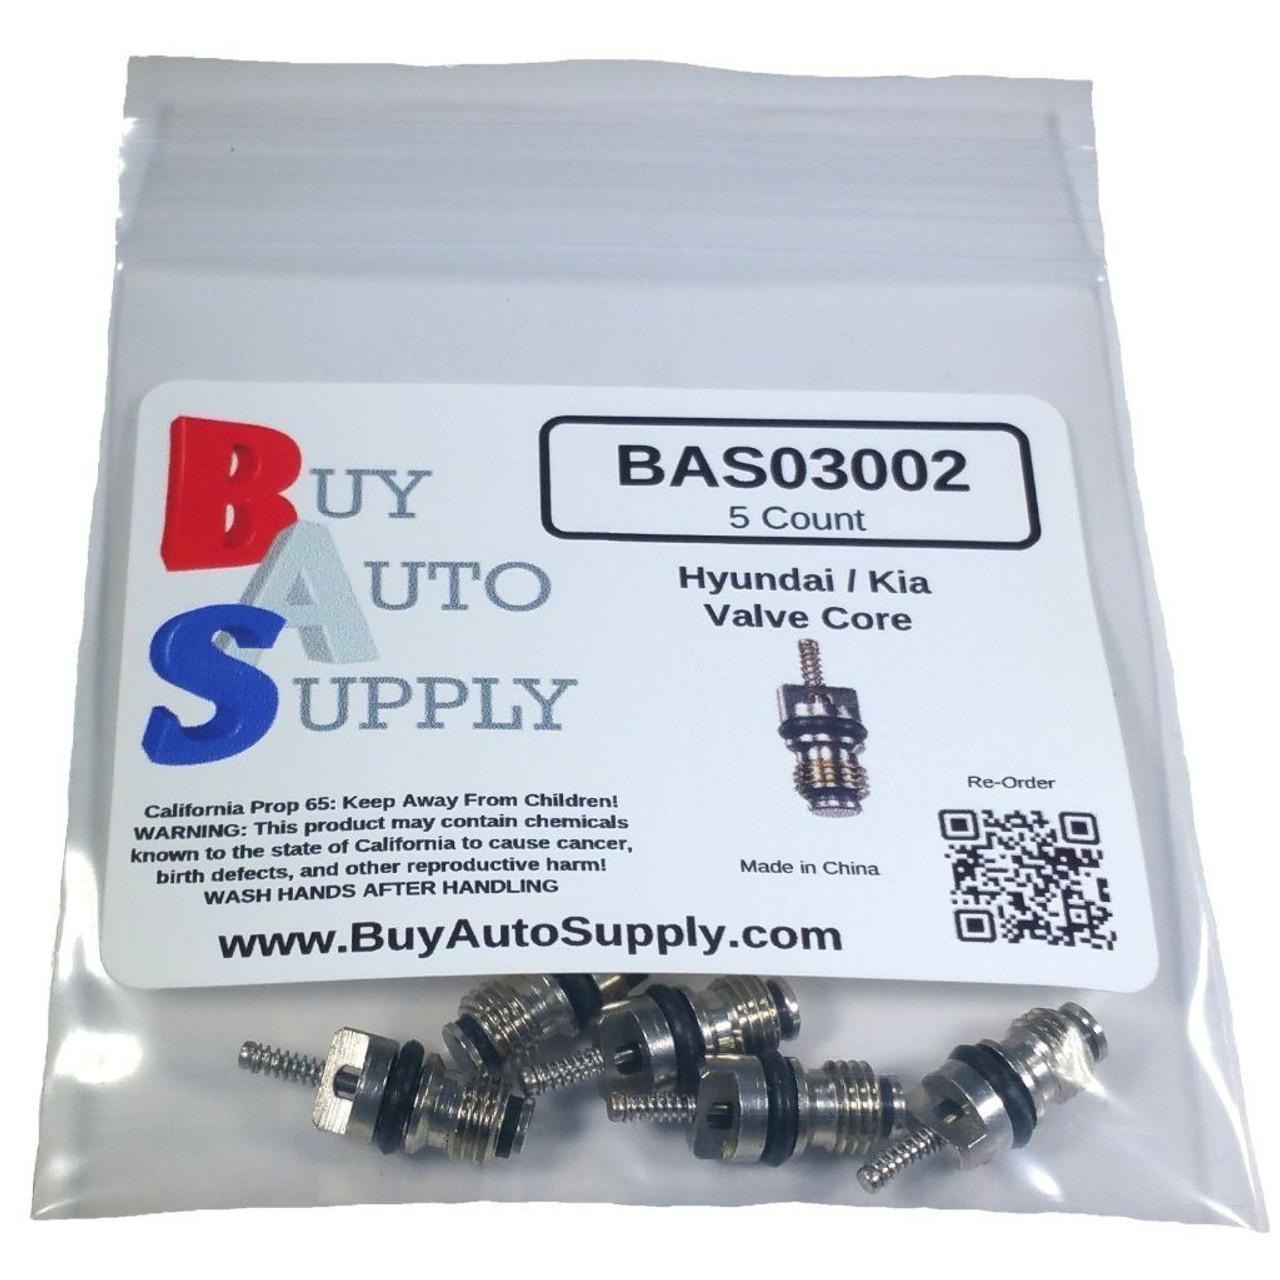 Bag of 5 Hyundai, Kia AC Valve Core R134A - Interchanges: 978122230